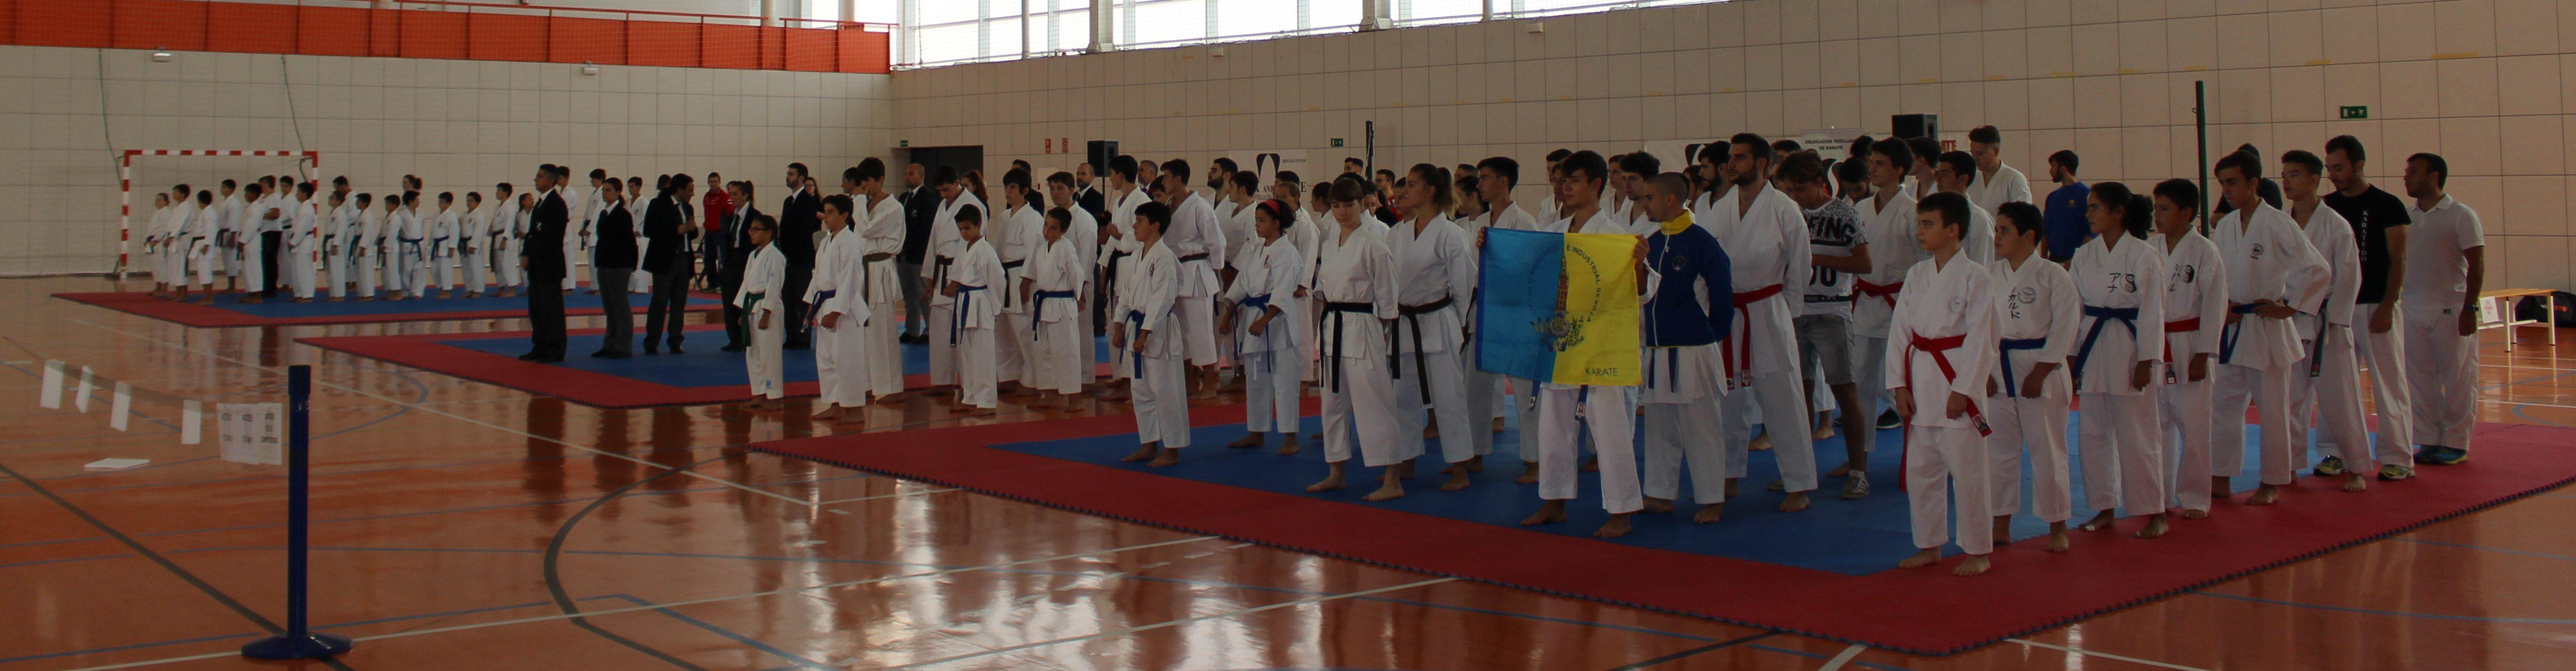 Iii torneo de la delegaci n sevillana de karate budoblog - Artes marciales sevilla ...